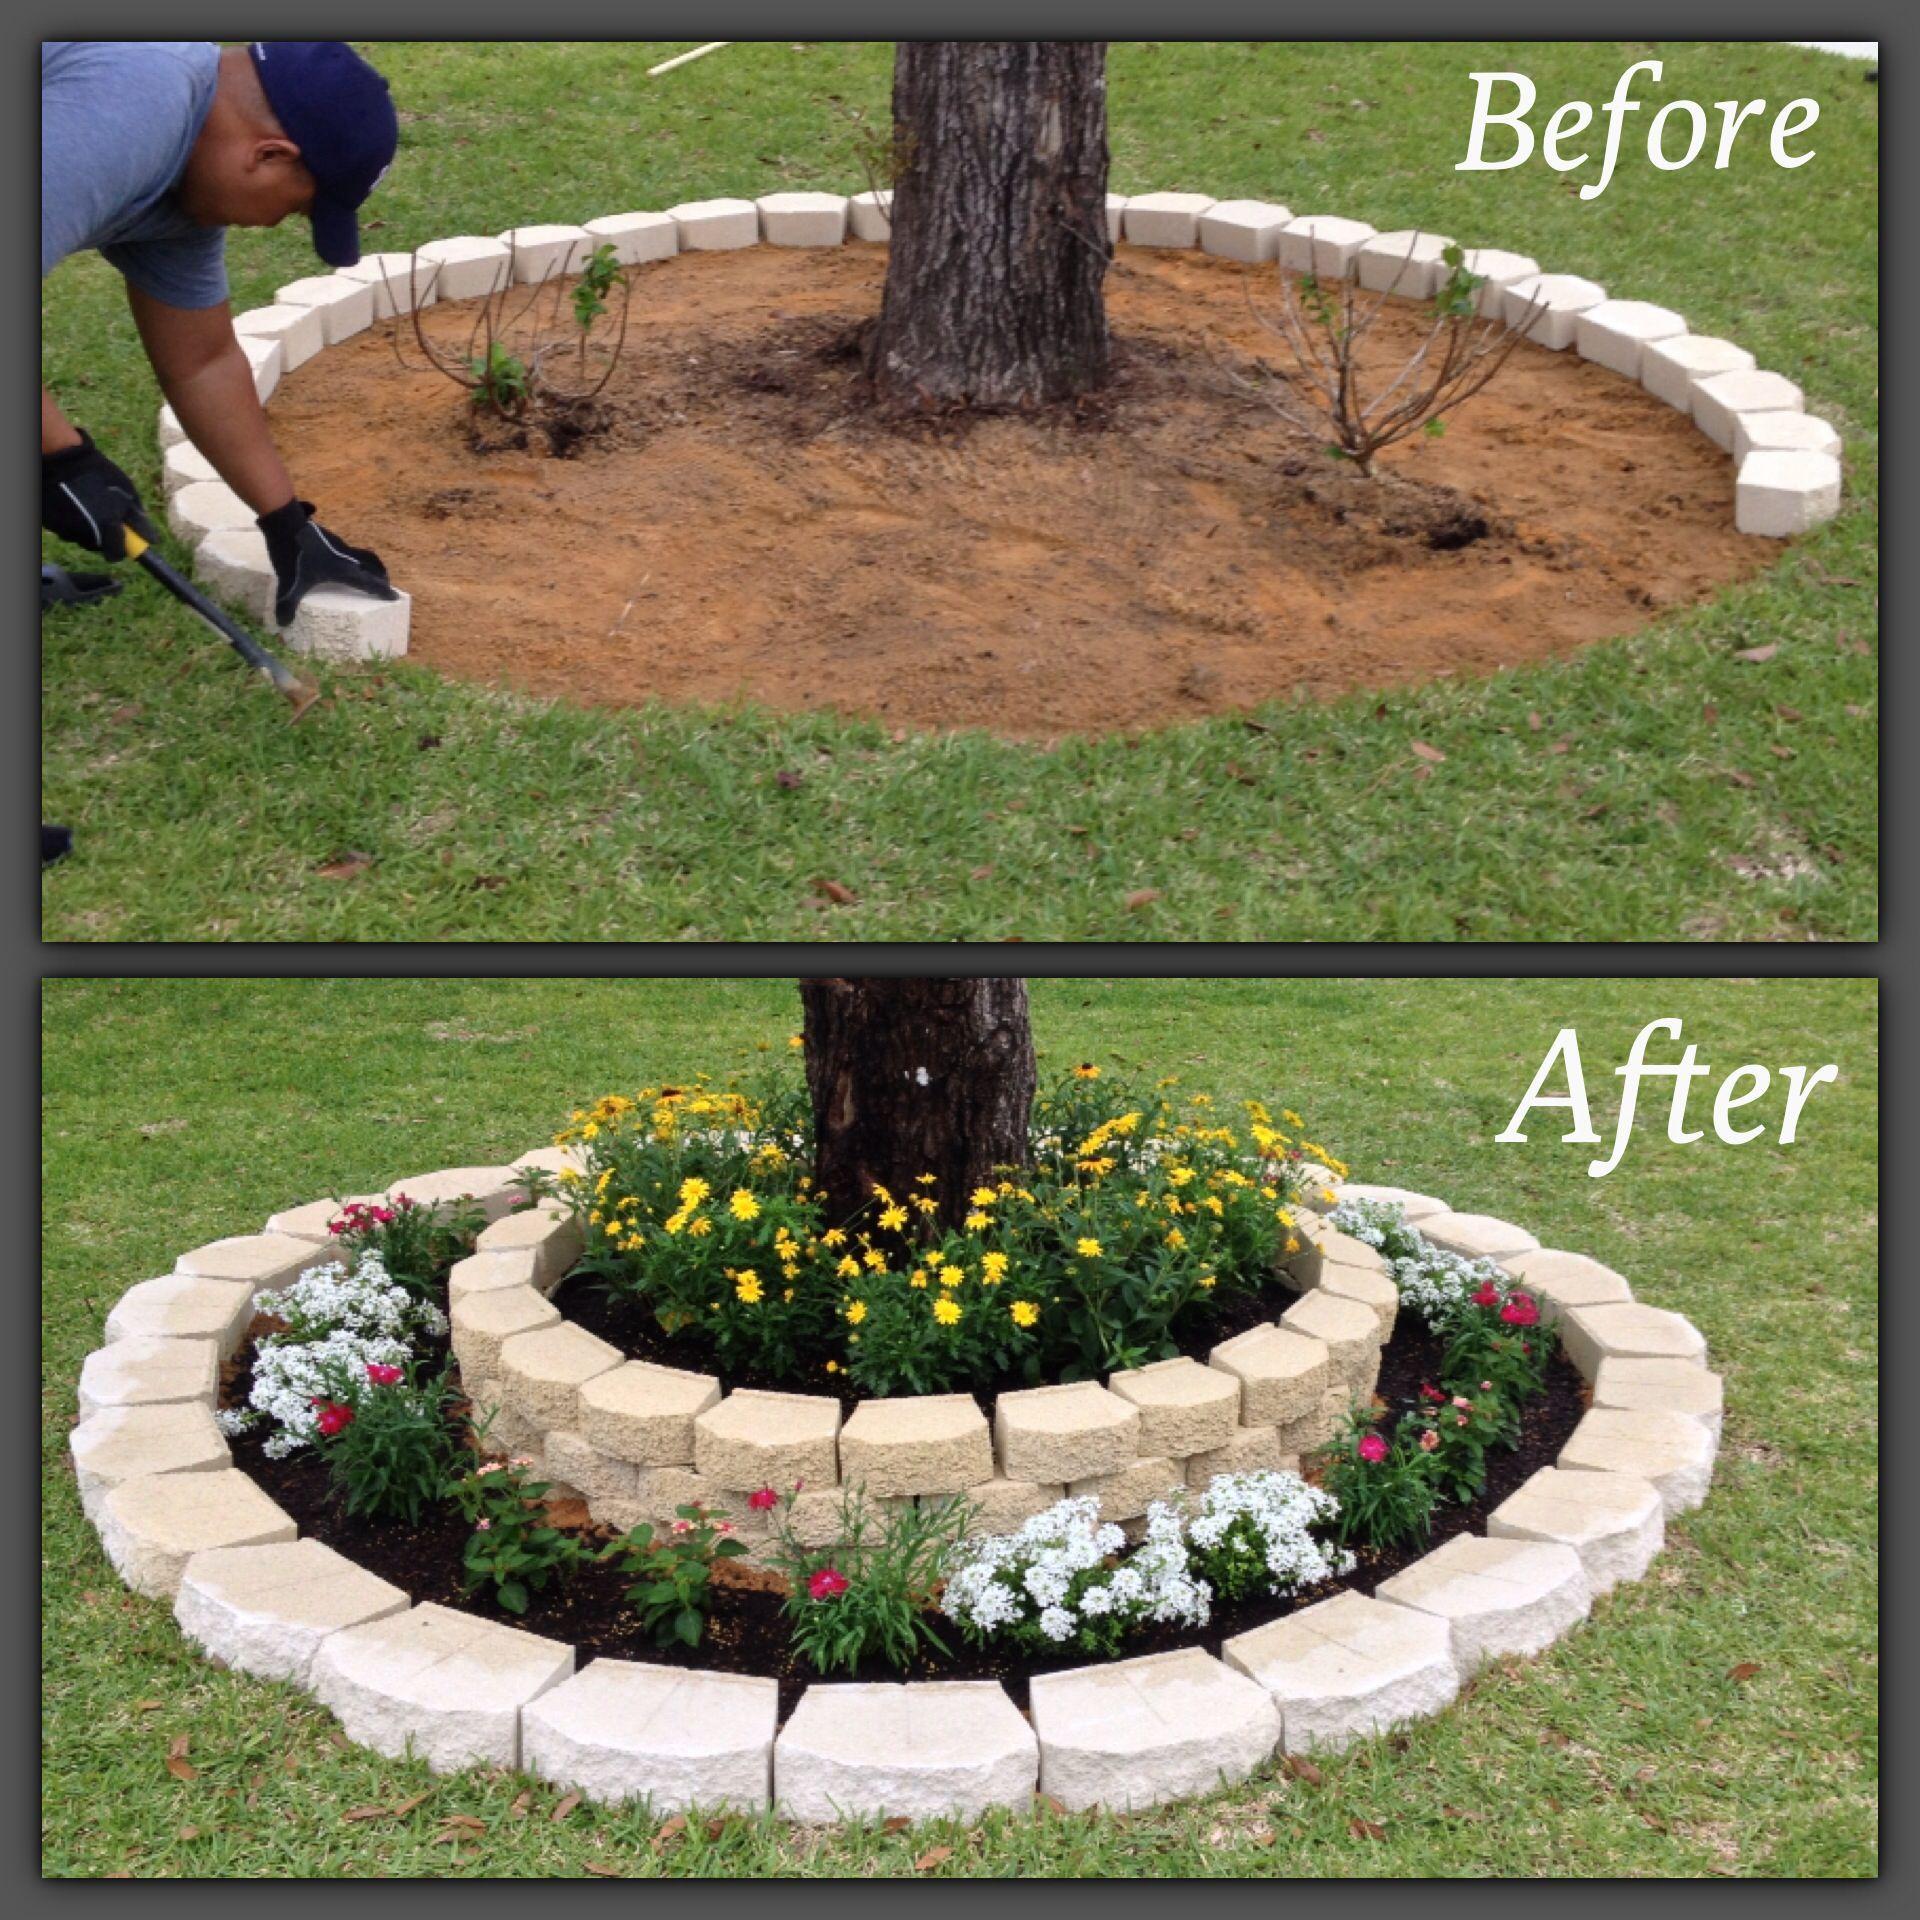 Photo of DIY Garden Landscape Idea-id#585220- by Budget101.com